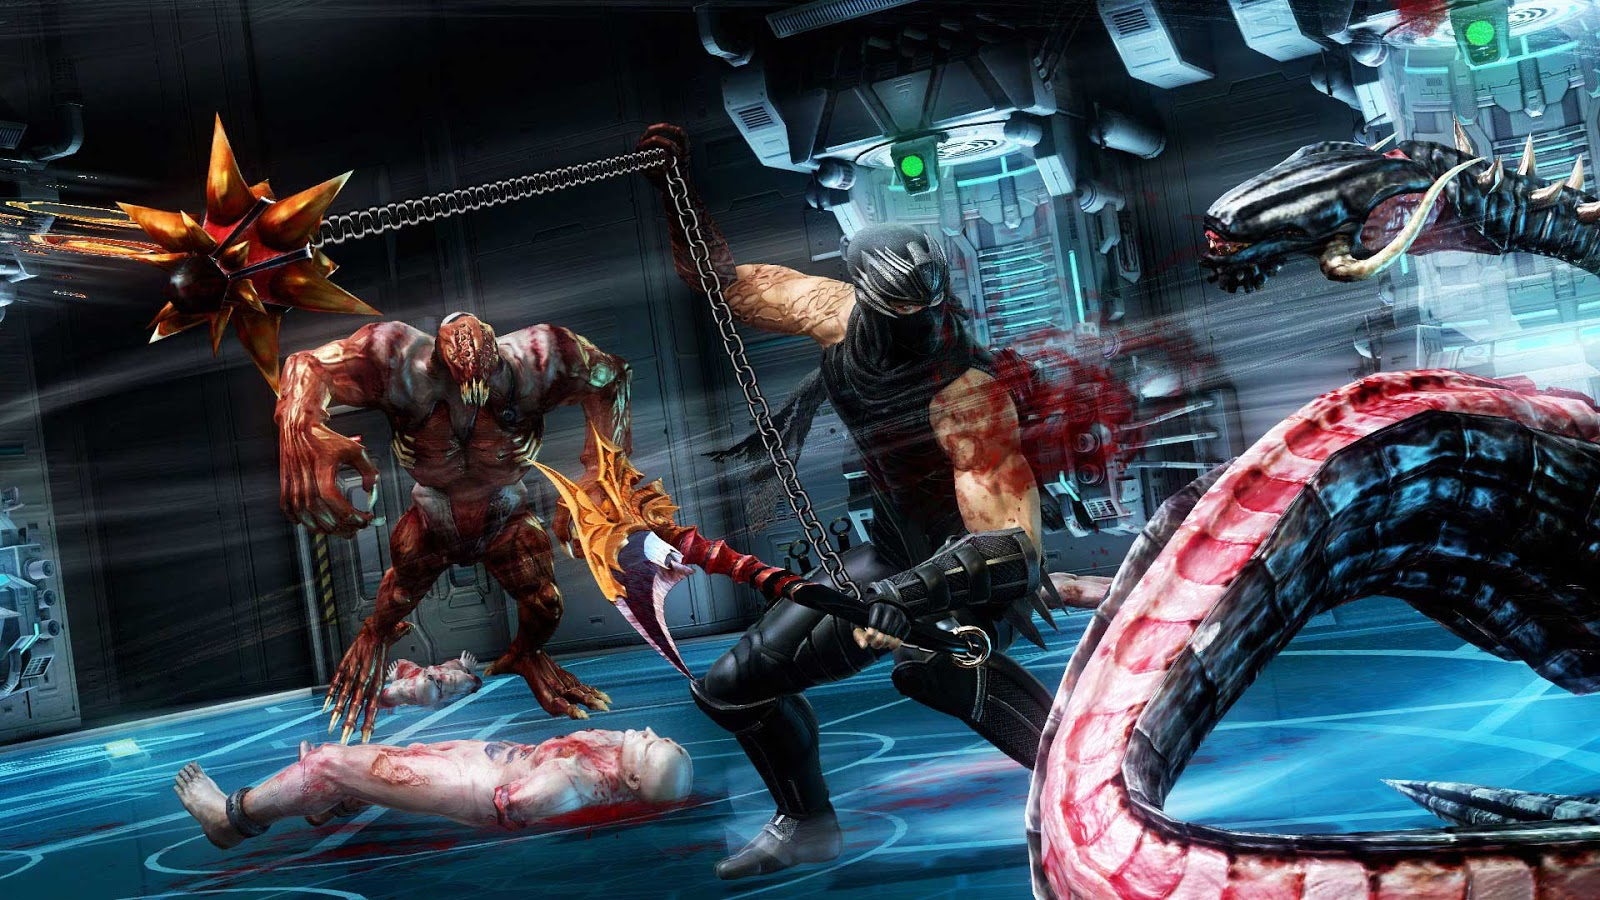 review: ninja gaiden 3: razor's edge (xbox 360) - digitally downloaded